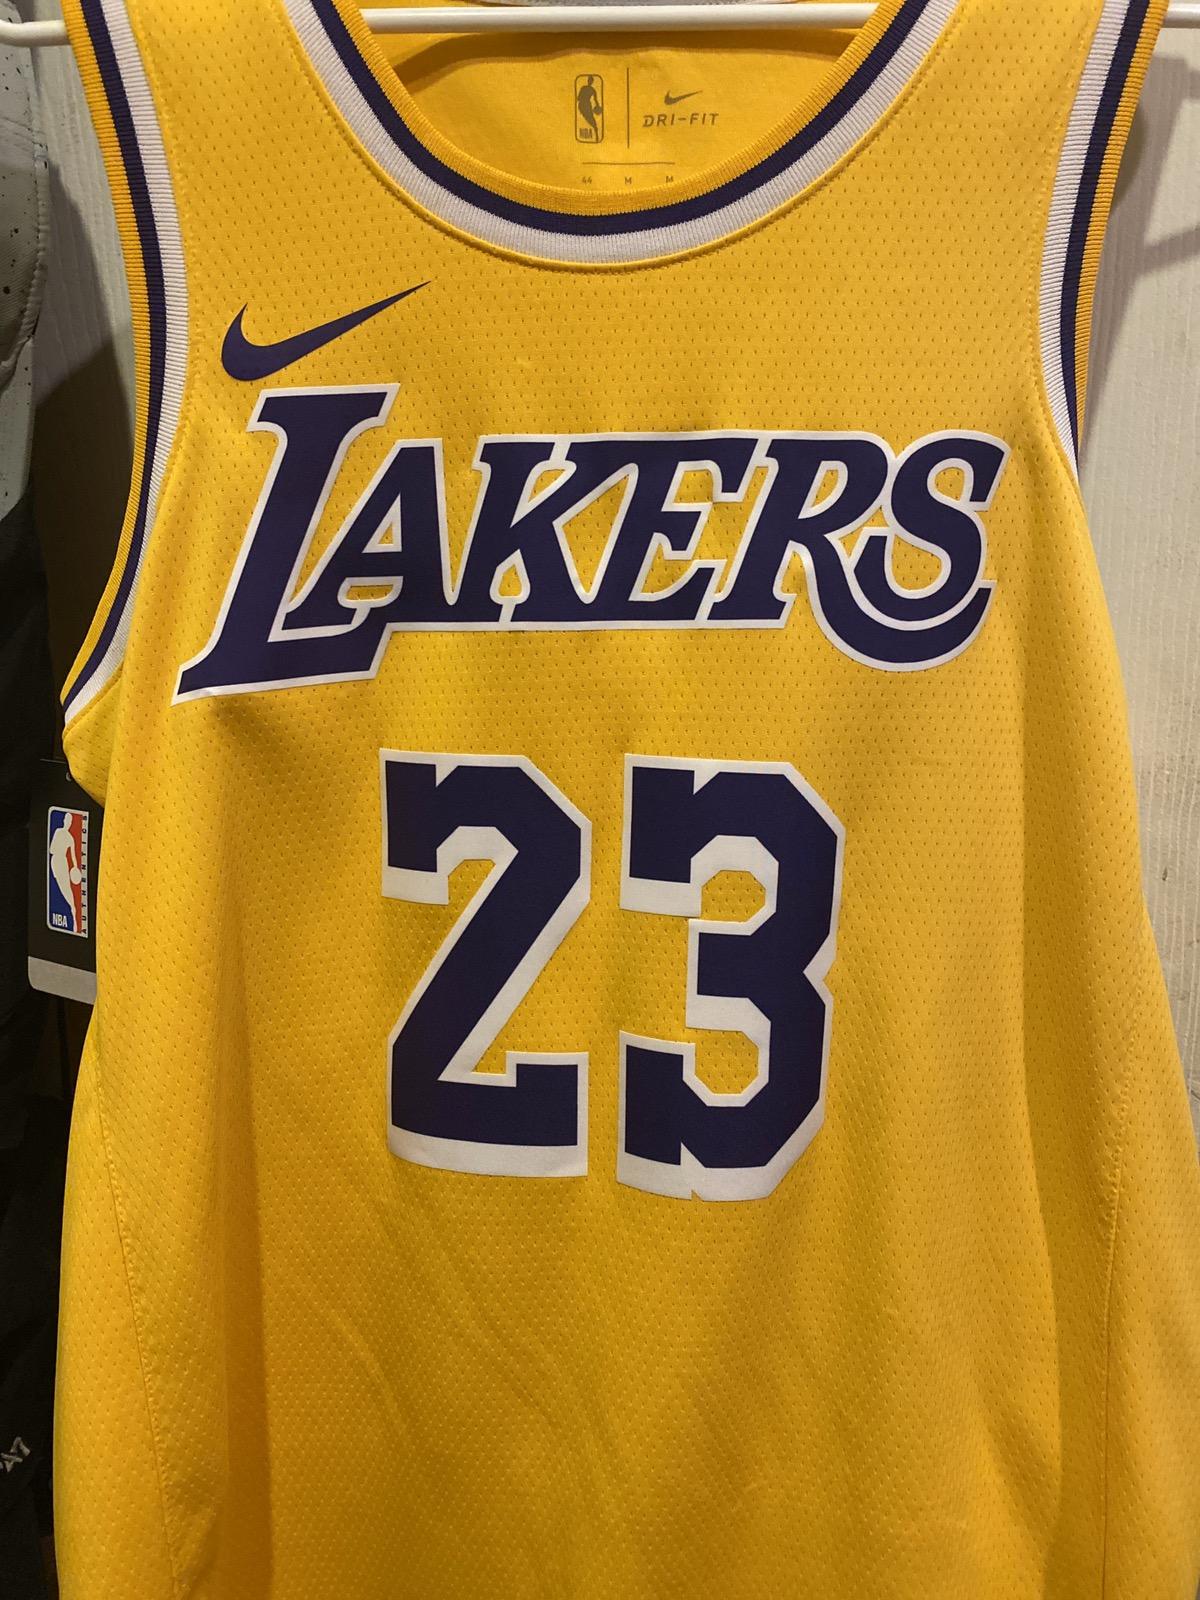 lebron authentic jersey